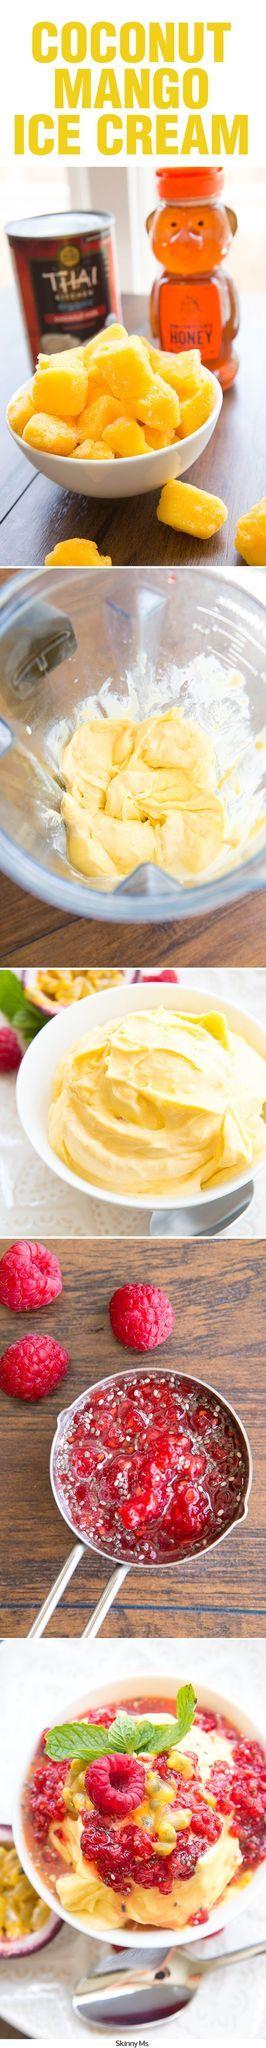 We all scream for 3-Ingredient Coconut Ice Cream!